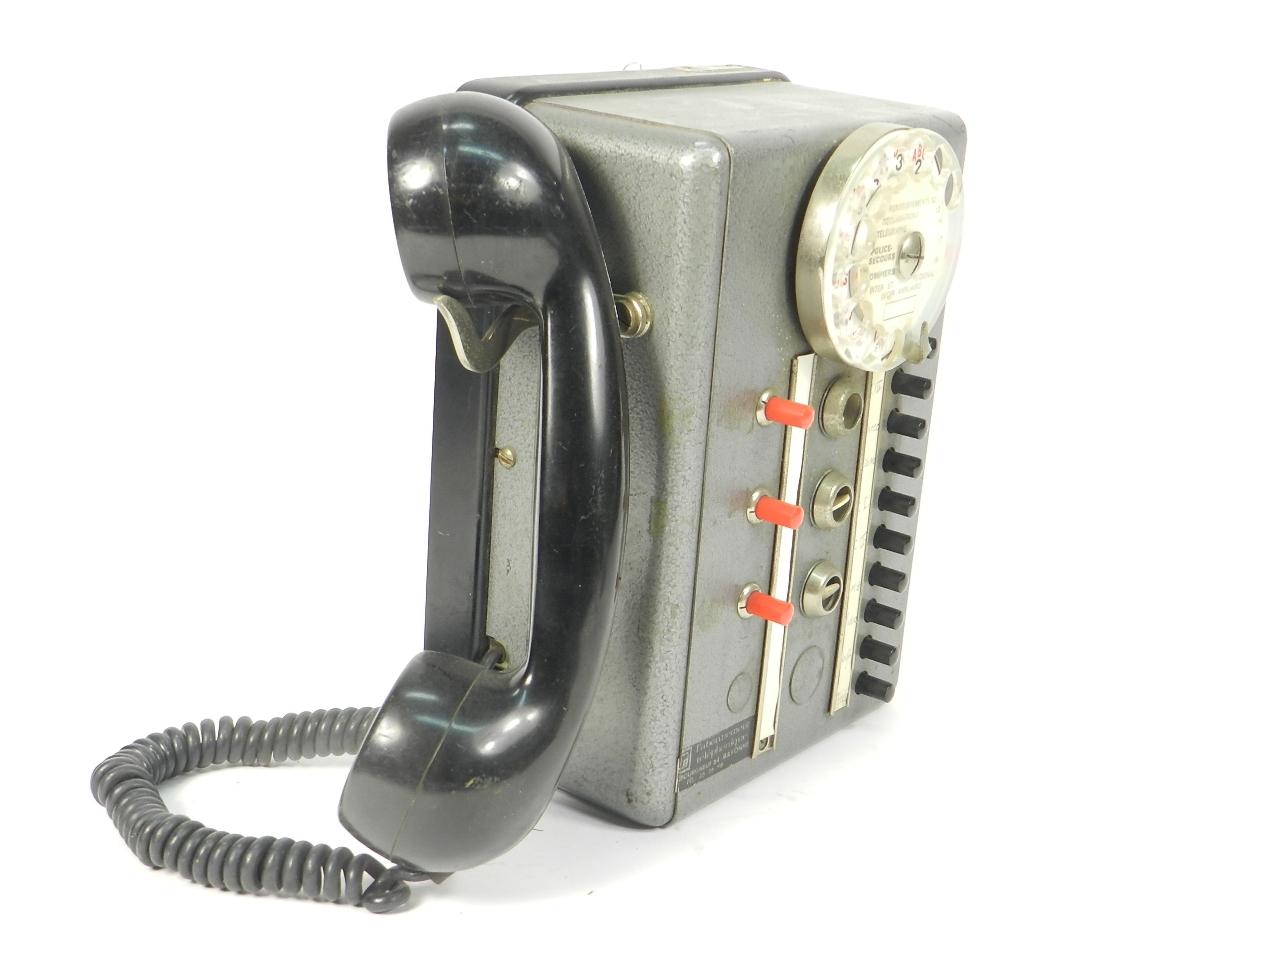 Imagen TELEFONO TÉLIC AÑO 1950, ESTRASBURGO 41684